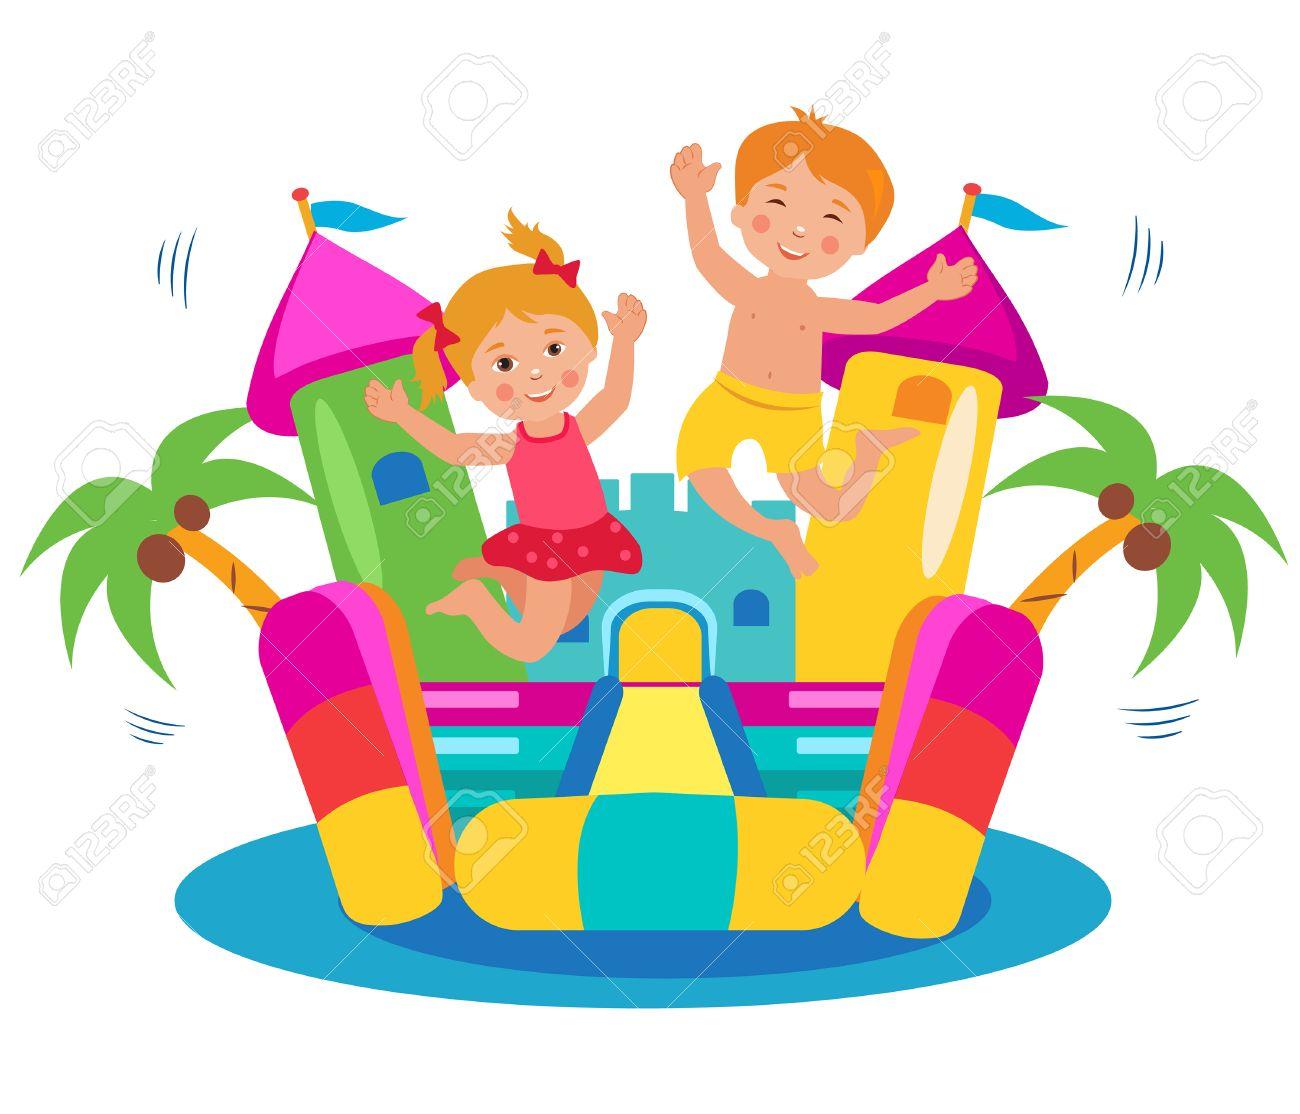 Cute Kids Jumping On A Bouncy Castle Set Cartoon Illustrations